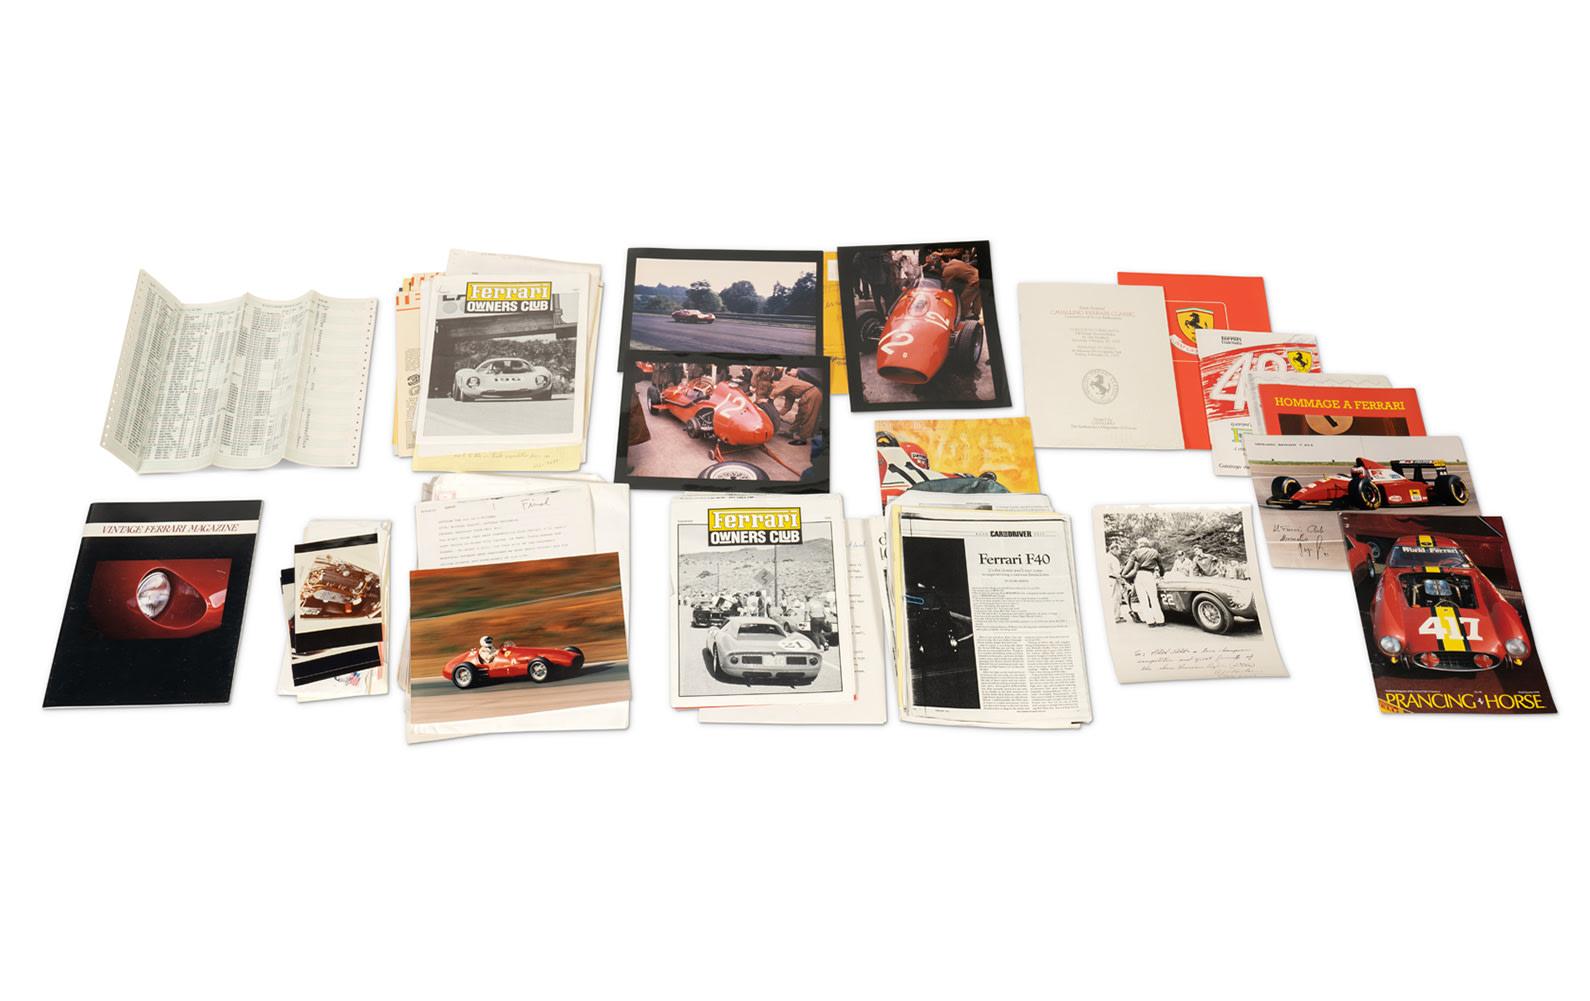 Prod/O21E - Phil Hill C 2021/C0191_Ferrari Paperwork and Files/C0191_Ferrari_Paperwork_Files_1_lzwvdy